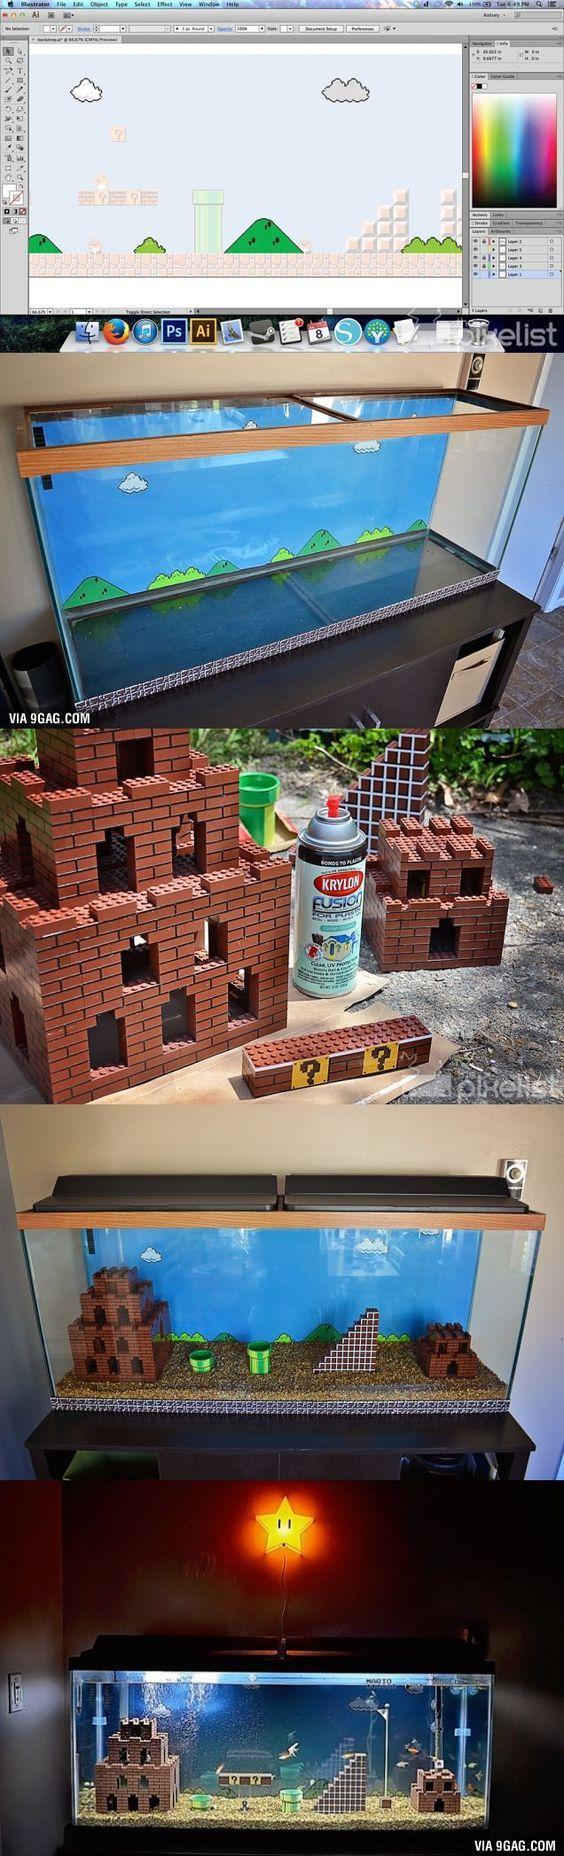 This Is How A Super Mario Bros. Aquarium Get Built From Scratch!: